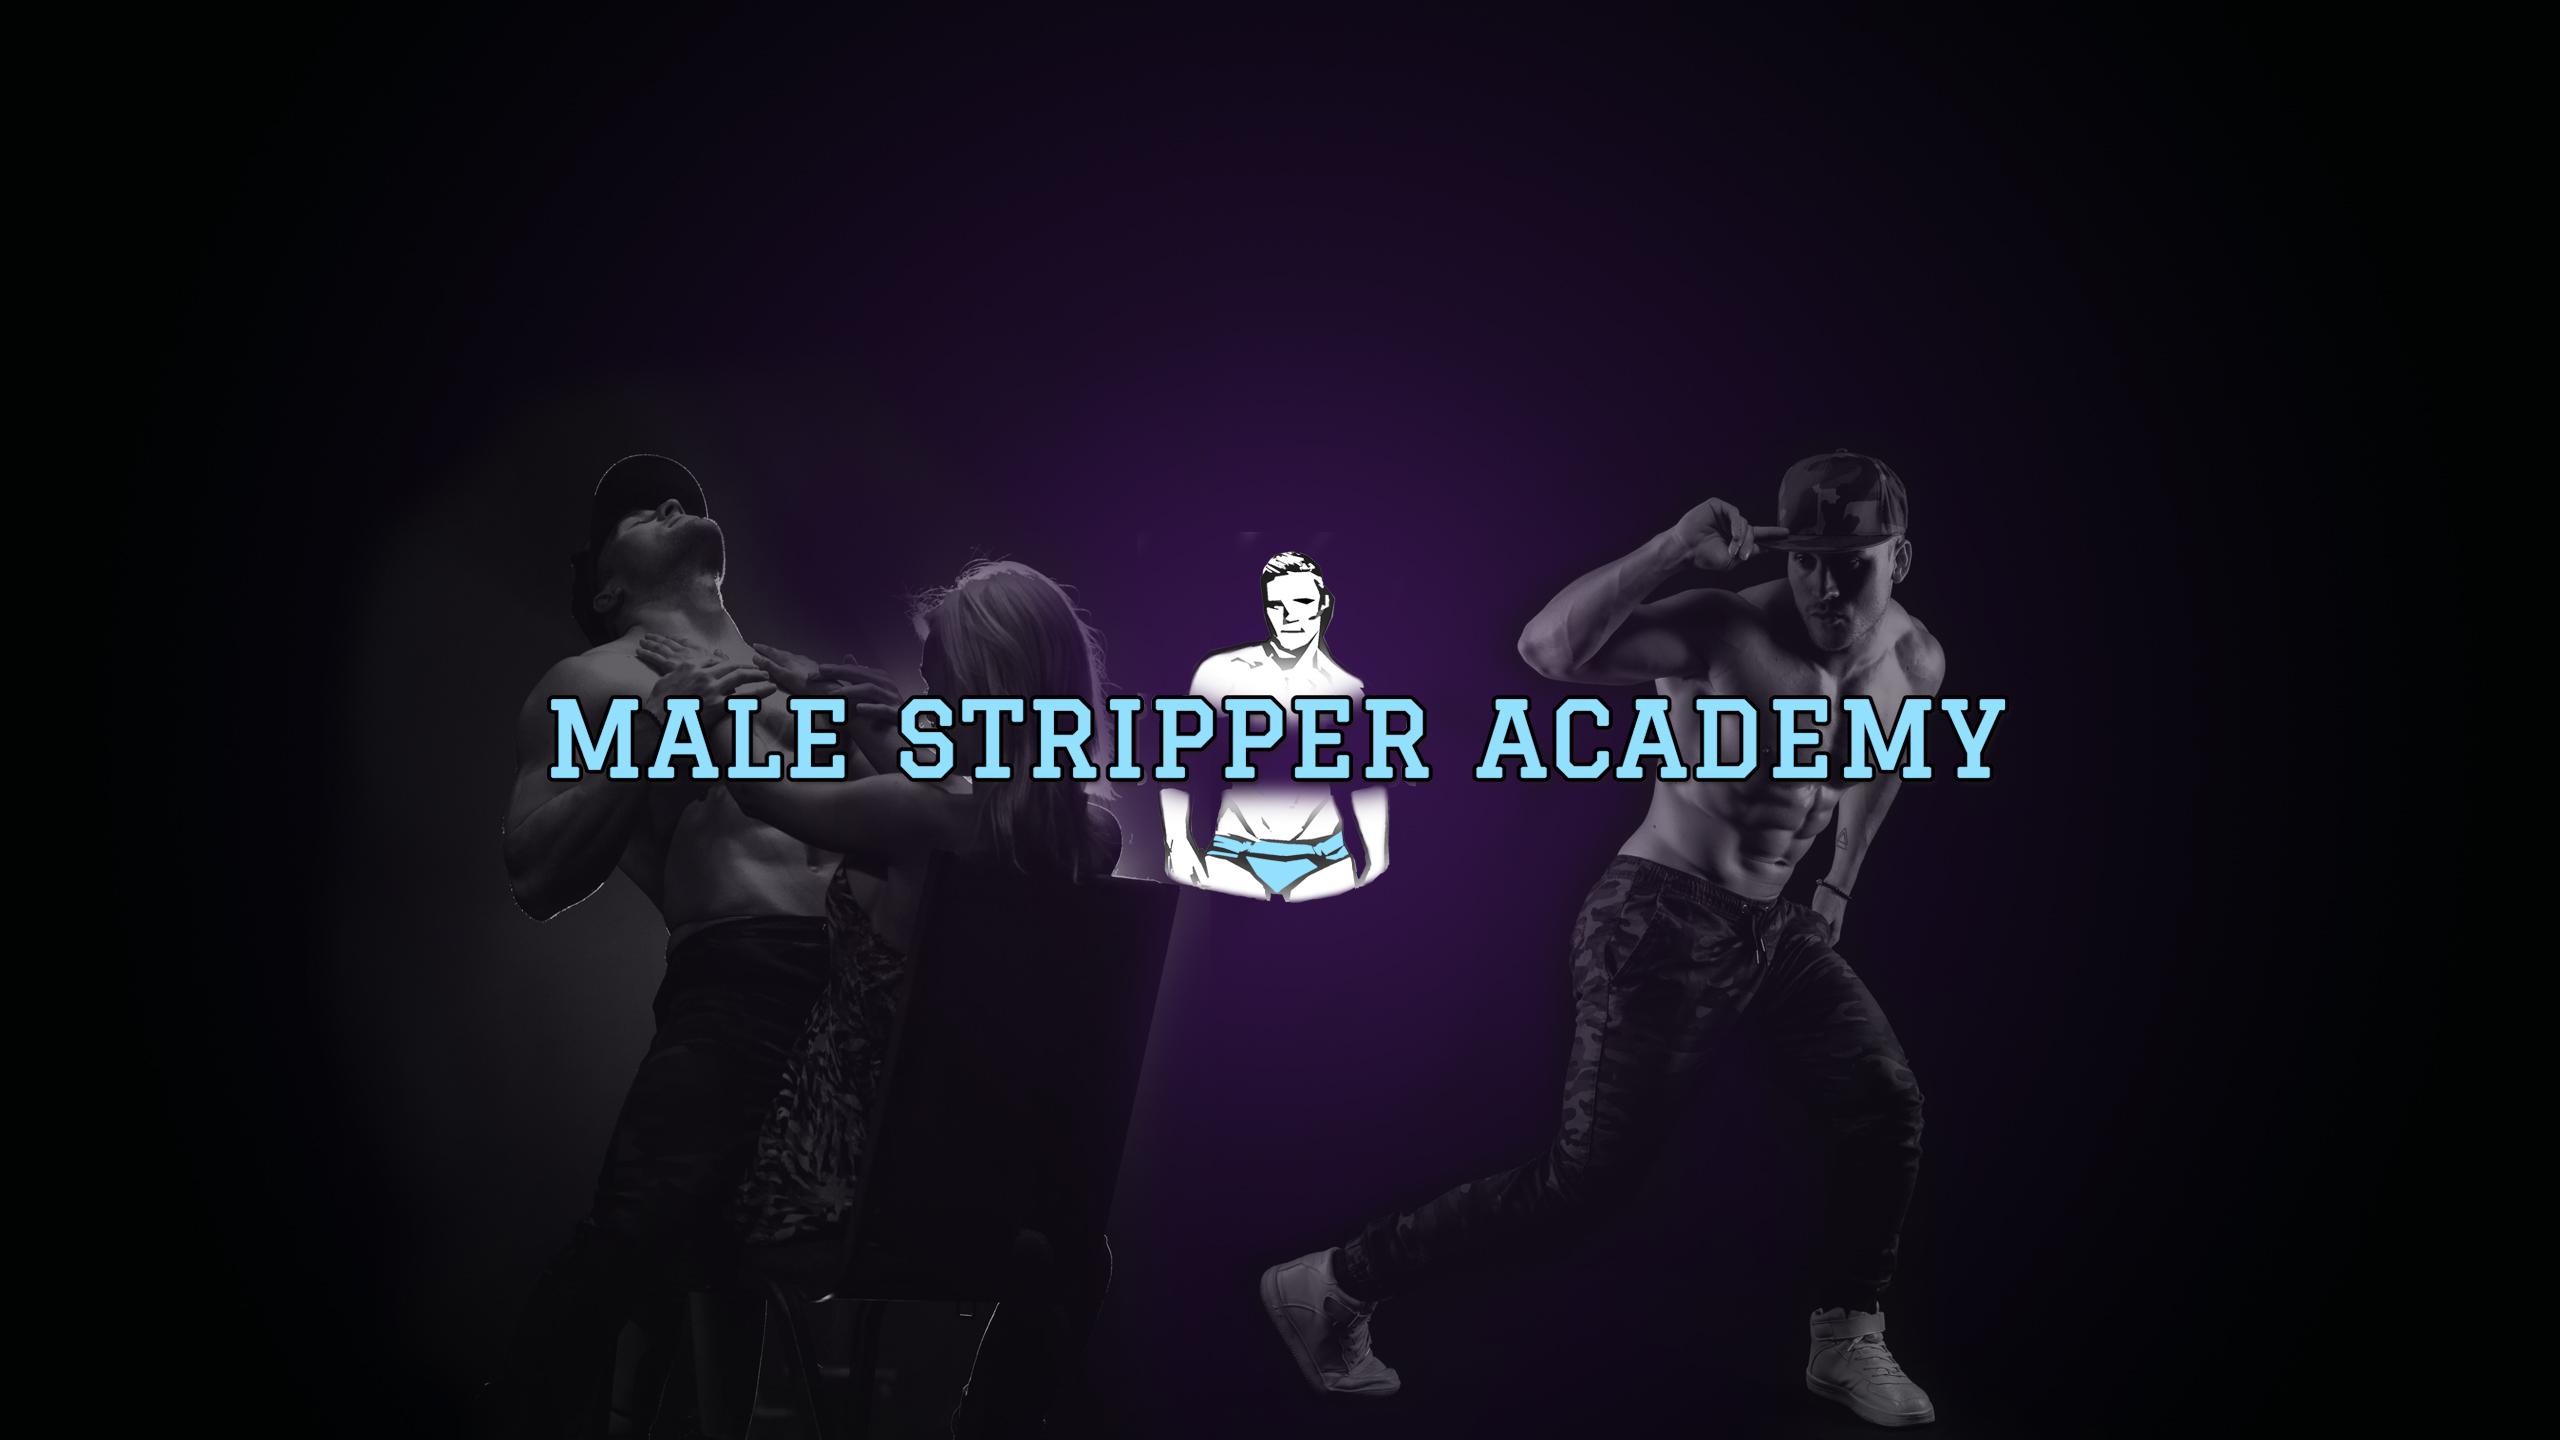 Boys for stripper names Name All